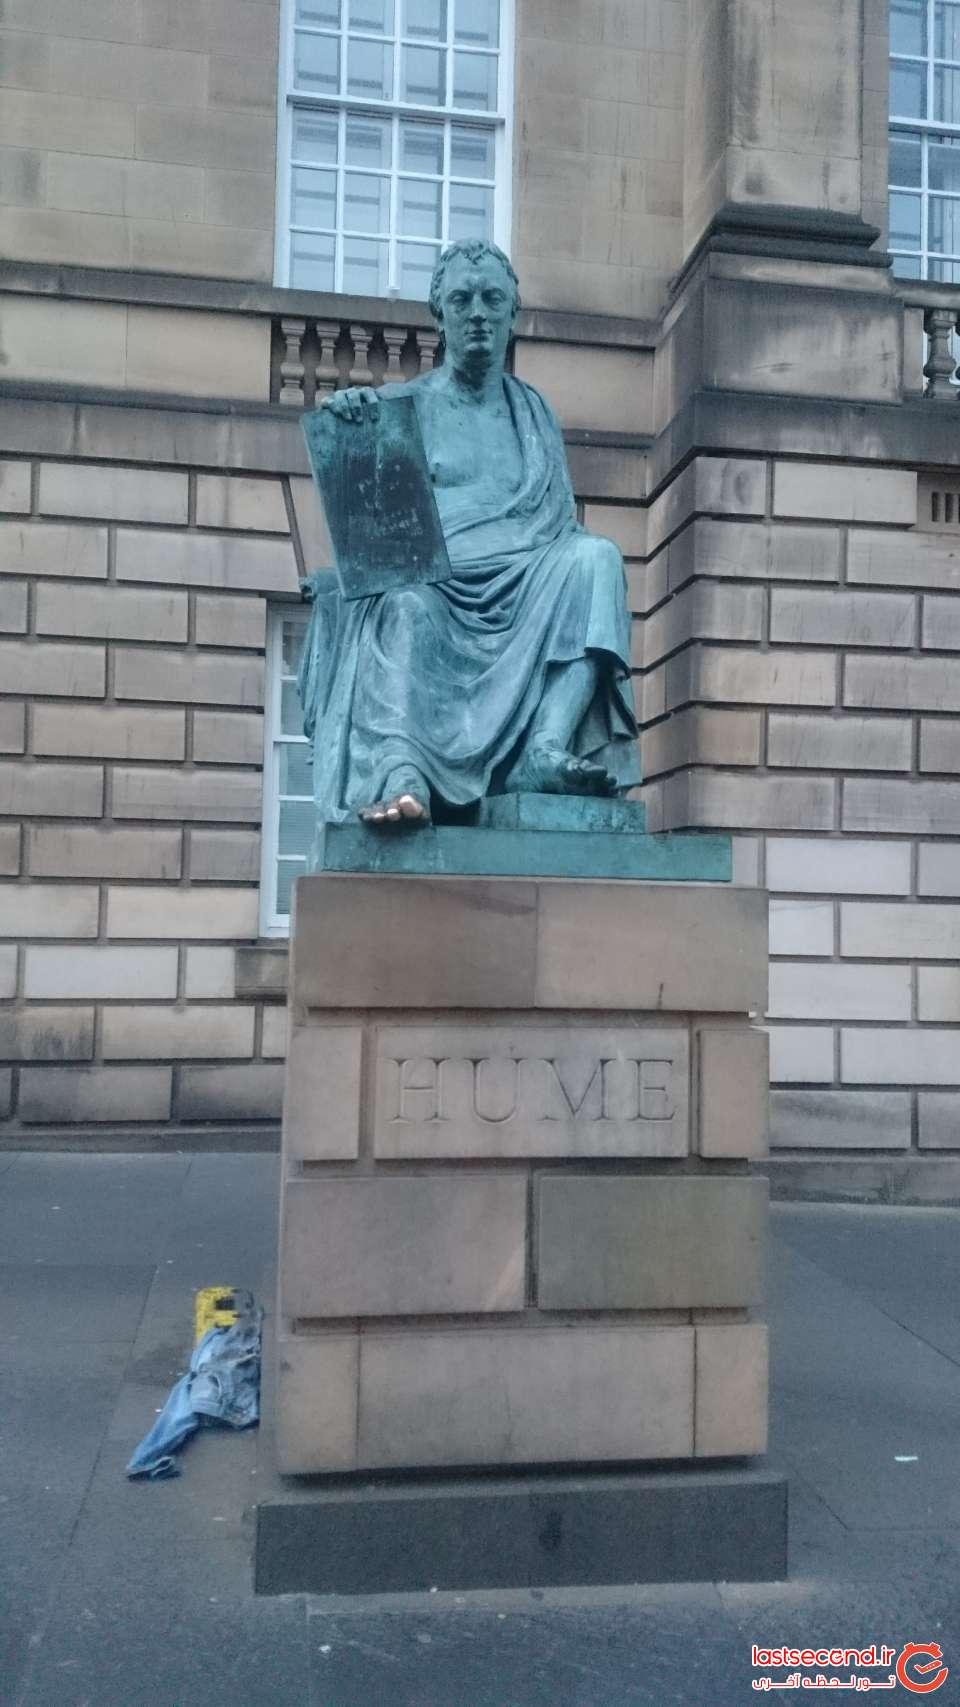 Edinburgh - سفر انگلستان 25شهریور تا 6 مهر 1396 (202).JPG